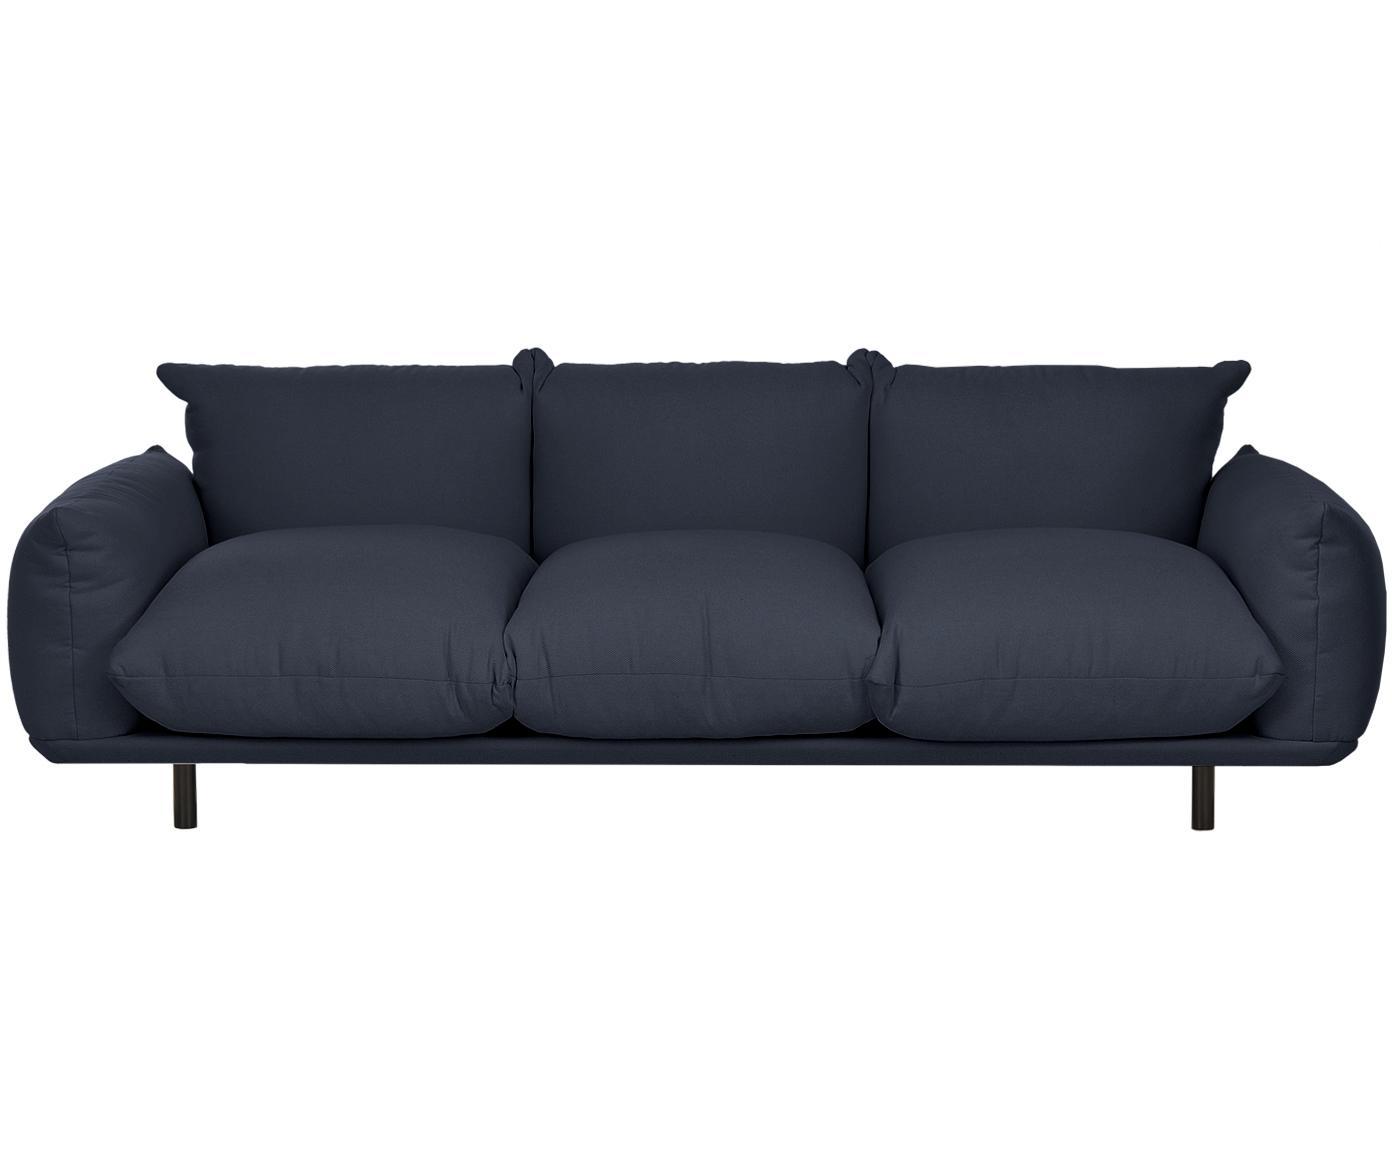 Sofa Saga (3-Sitzer), Bezug: 100% Polyester 35.000 Sch, Gestell: Massives Birkenholz, Webstoff Dunkelblau, B 232 x T 103 cm